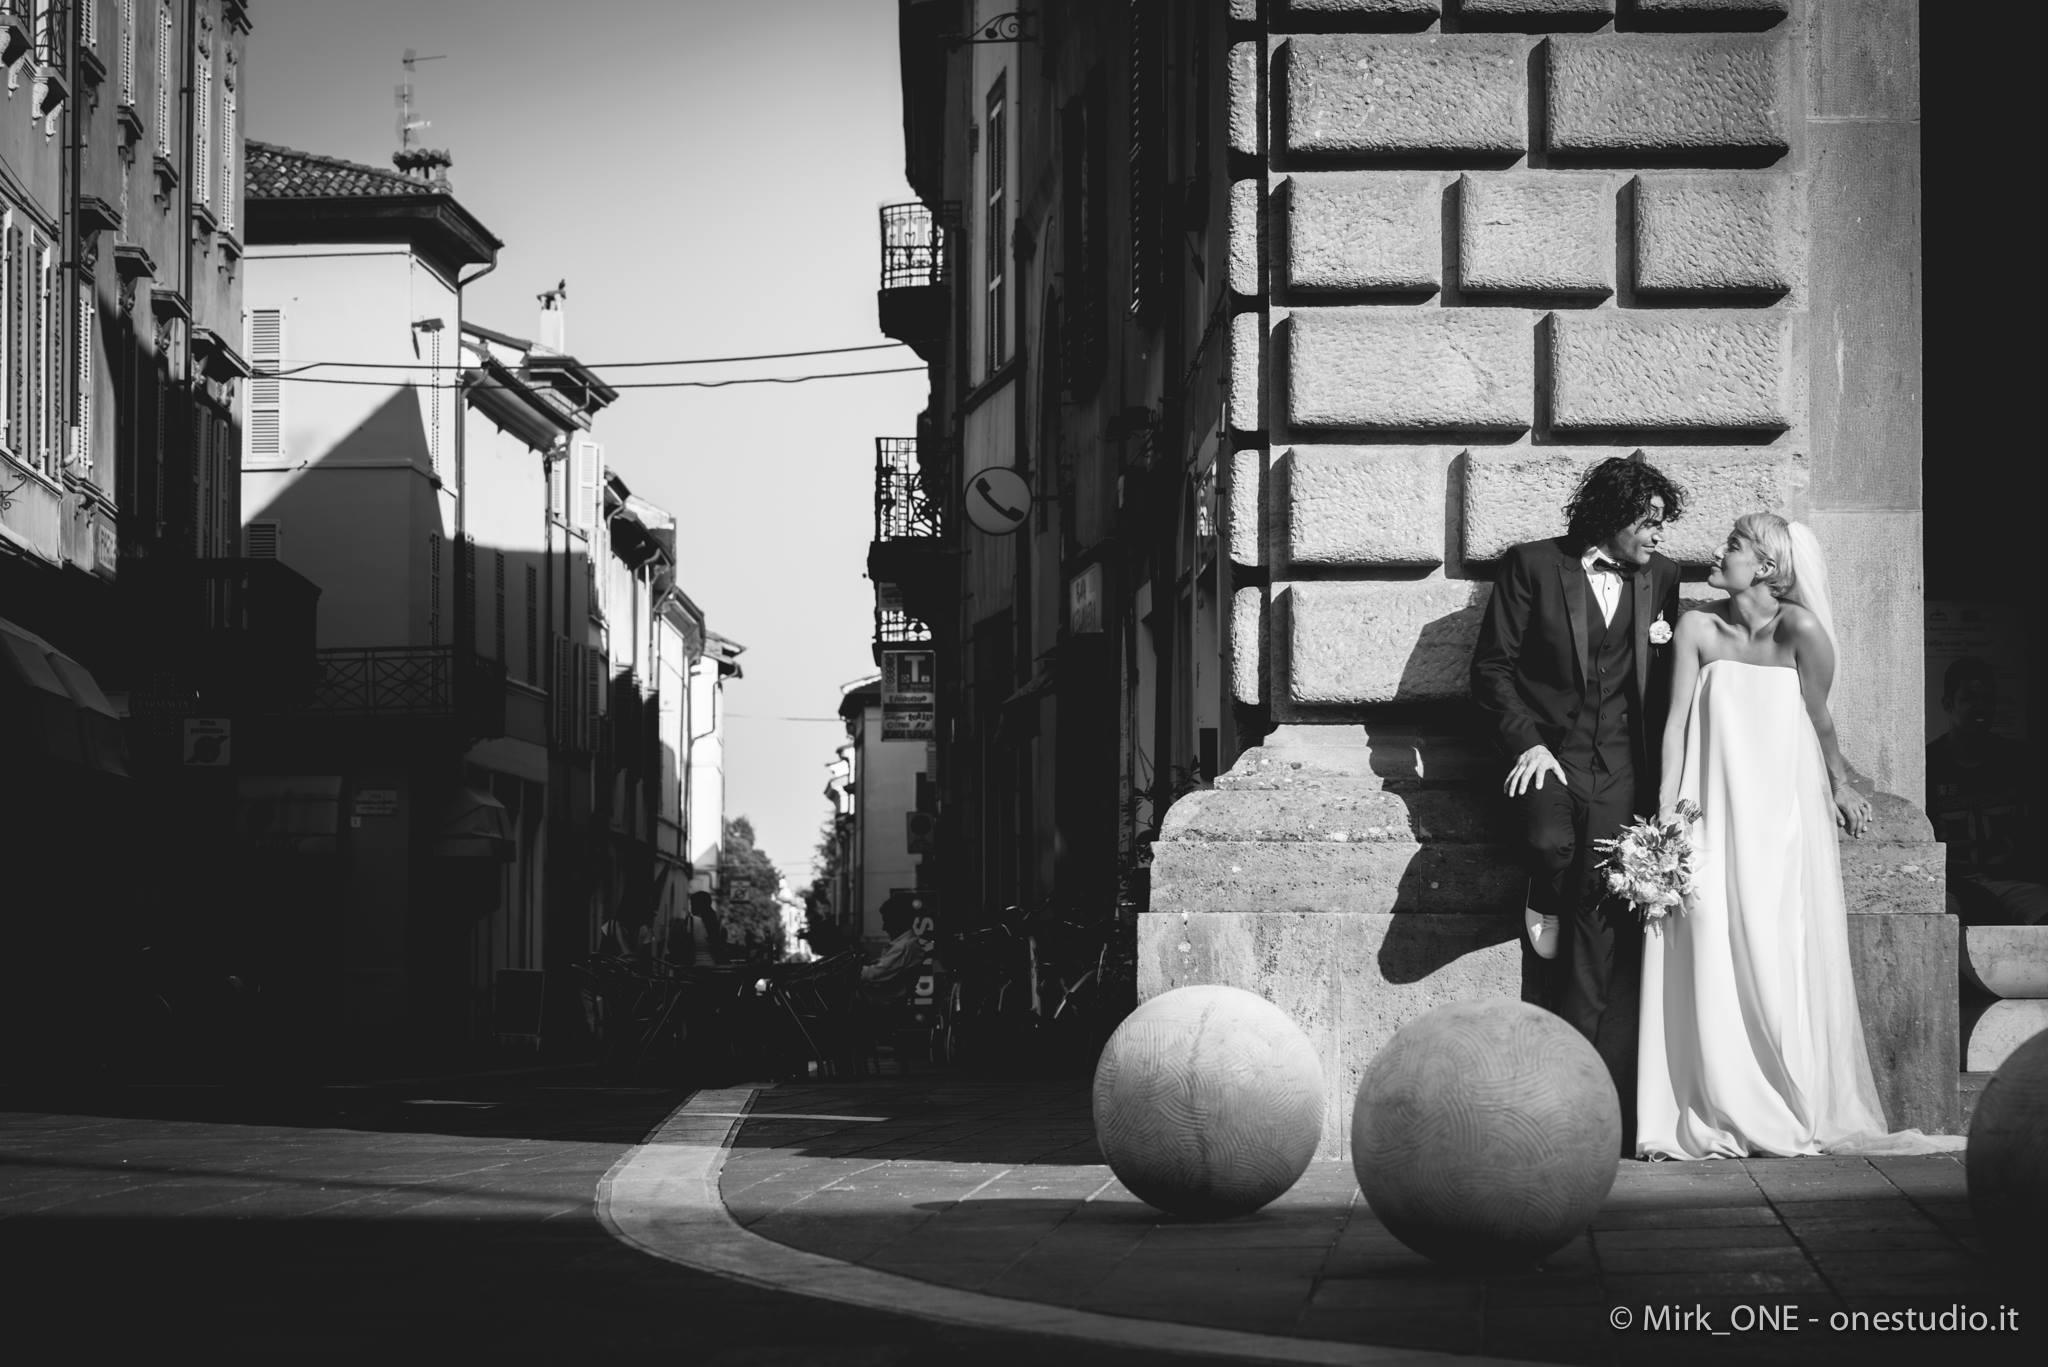 https://lnx.mirkone.it/wp-content/uploads/2015/07/mirk_ONE-fotografo-matrimonio-00825.jpg